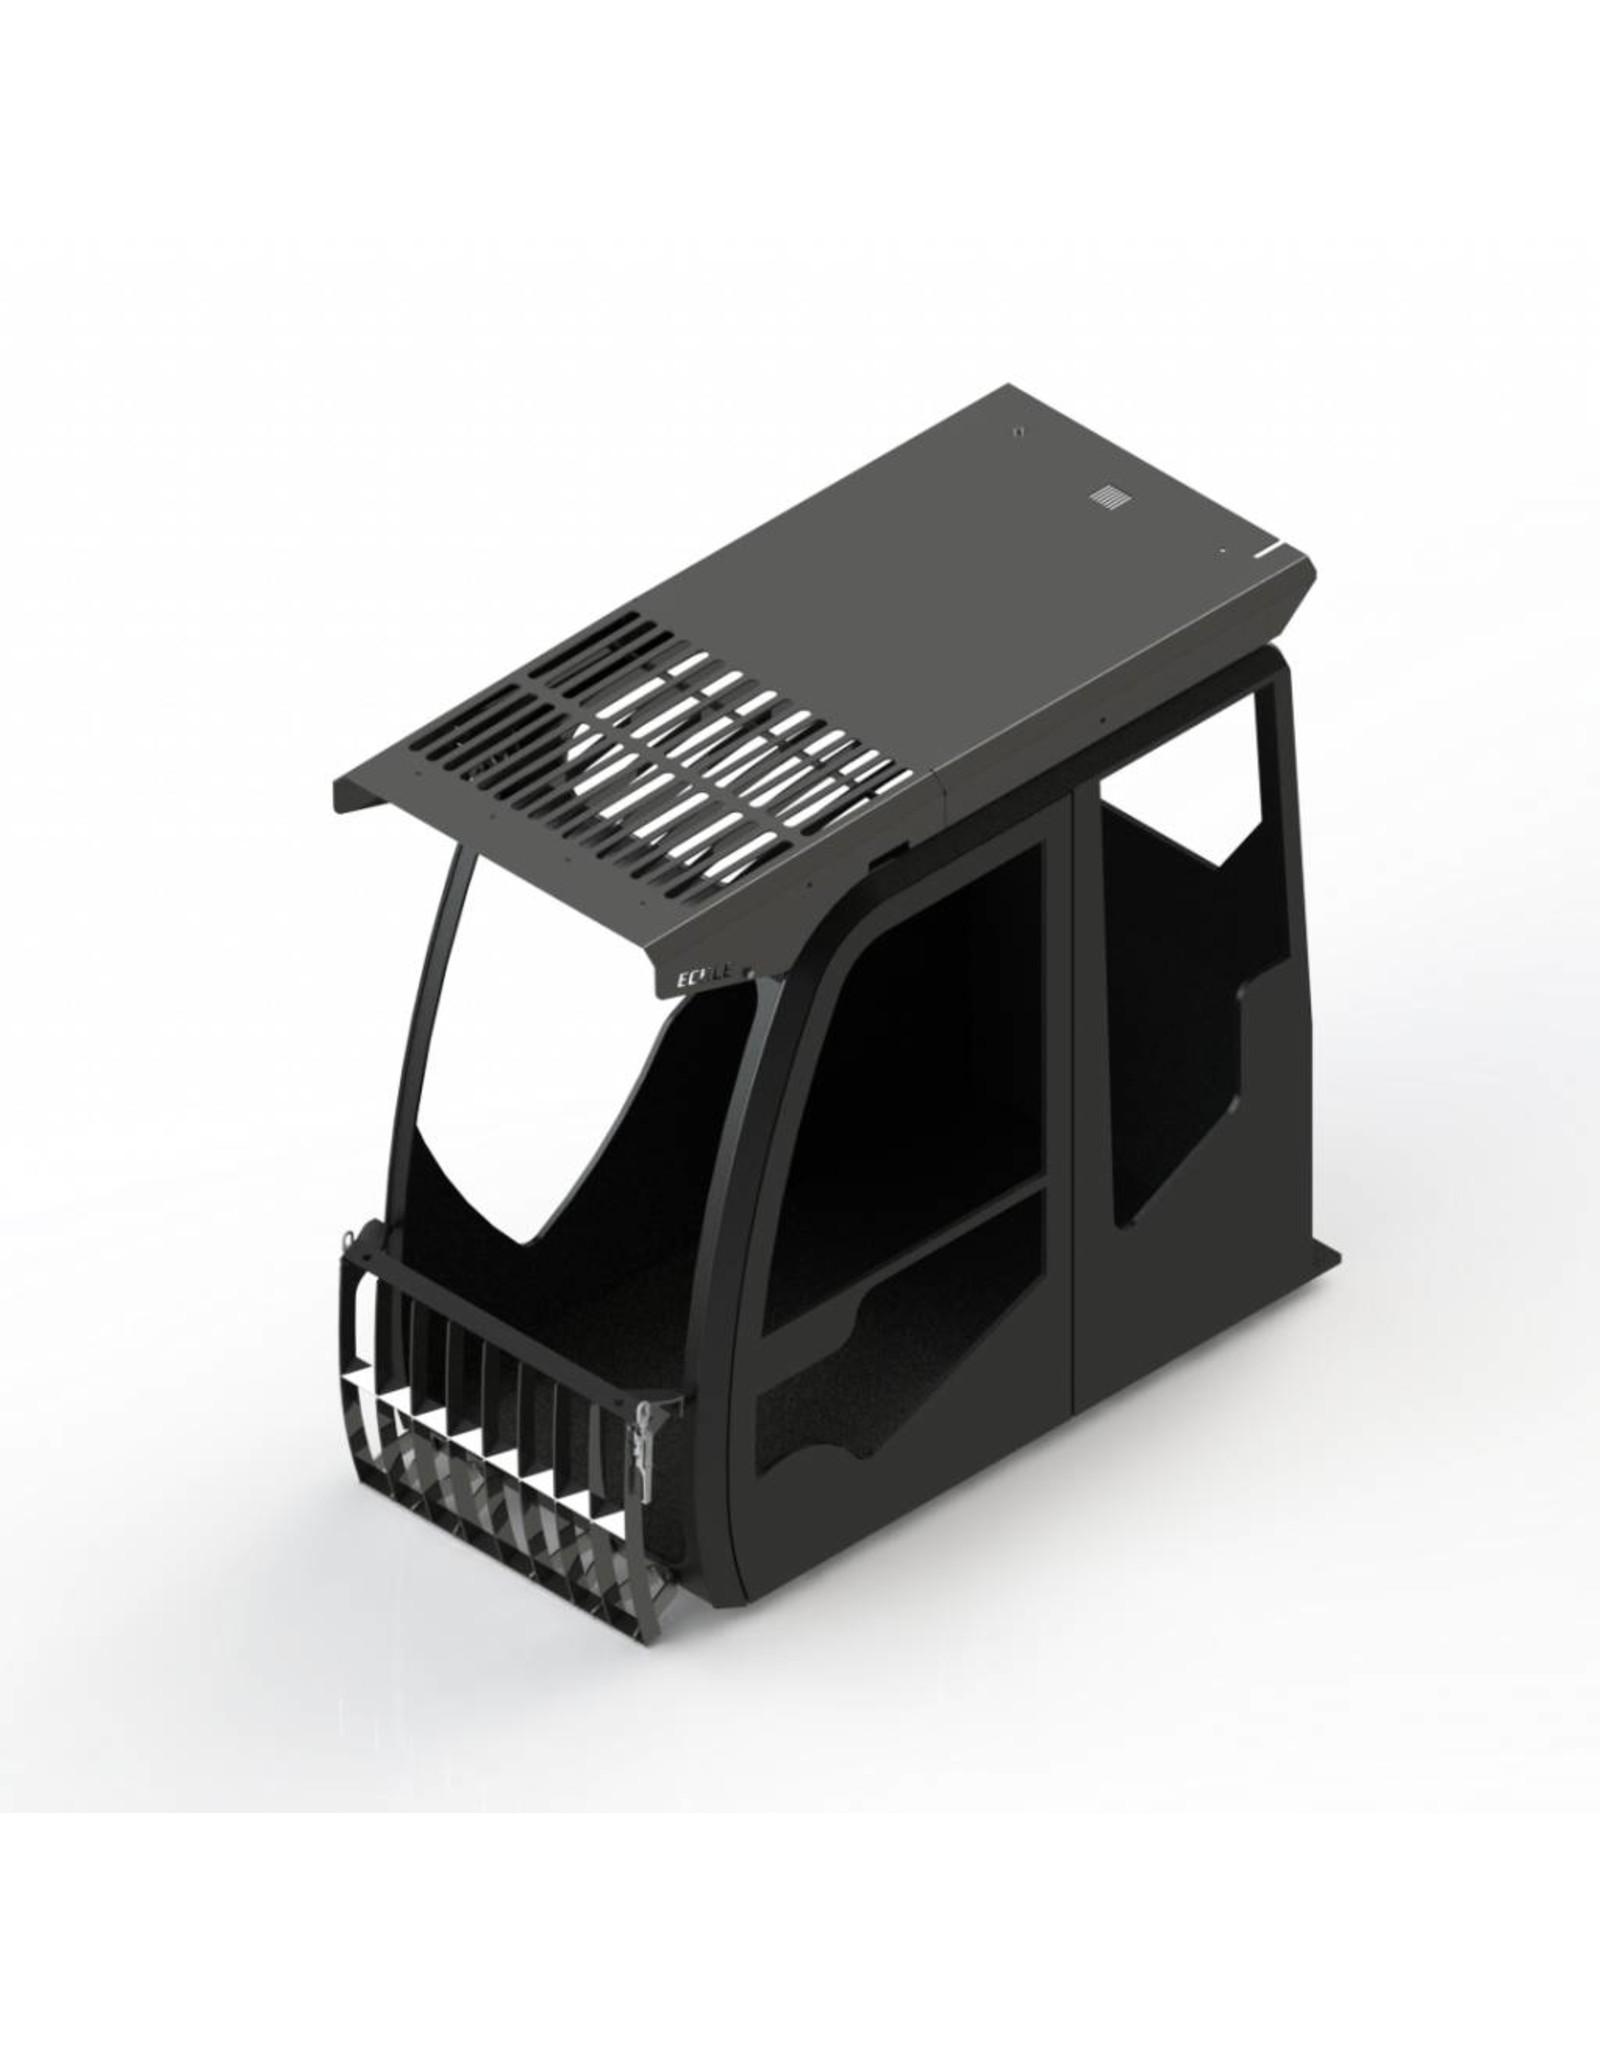 Echle Hartstahl GmbH FOPS für Volvo EC480E